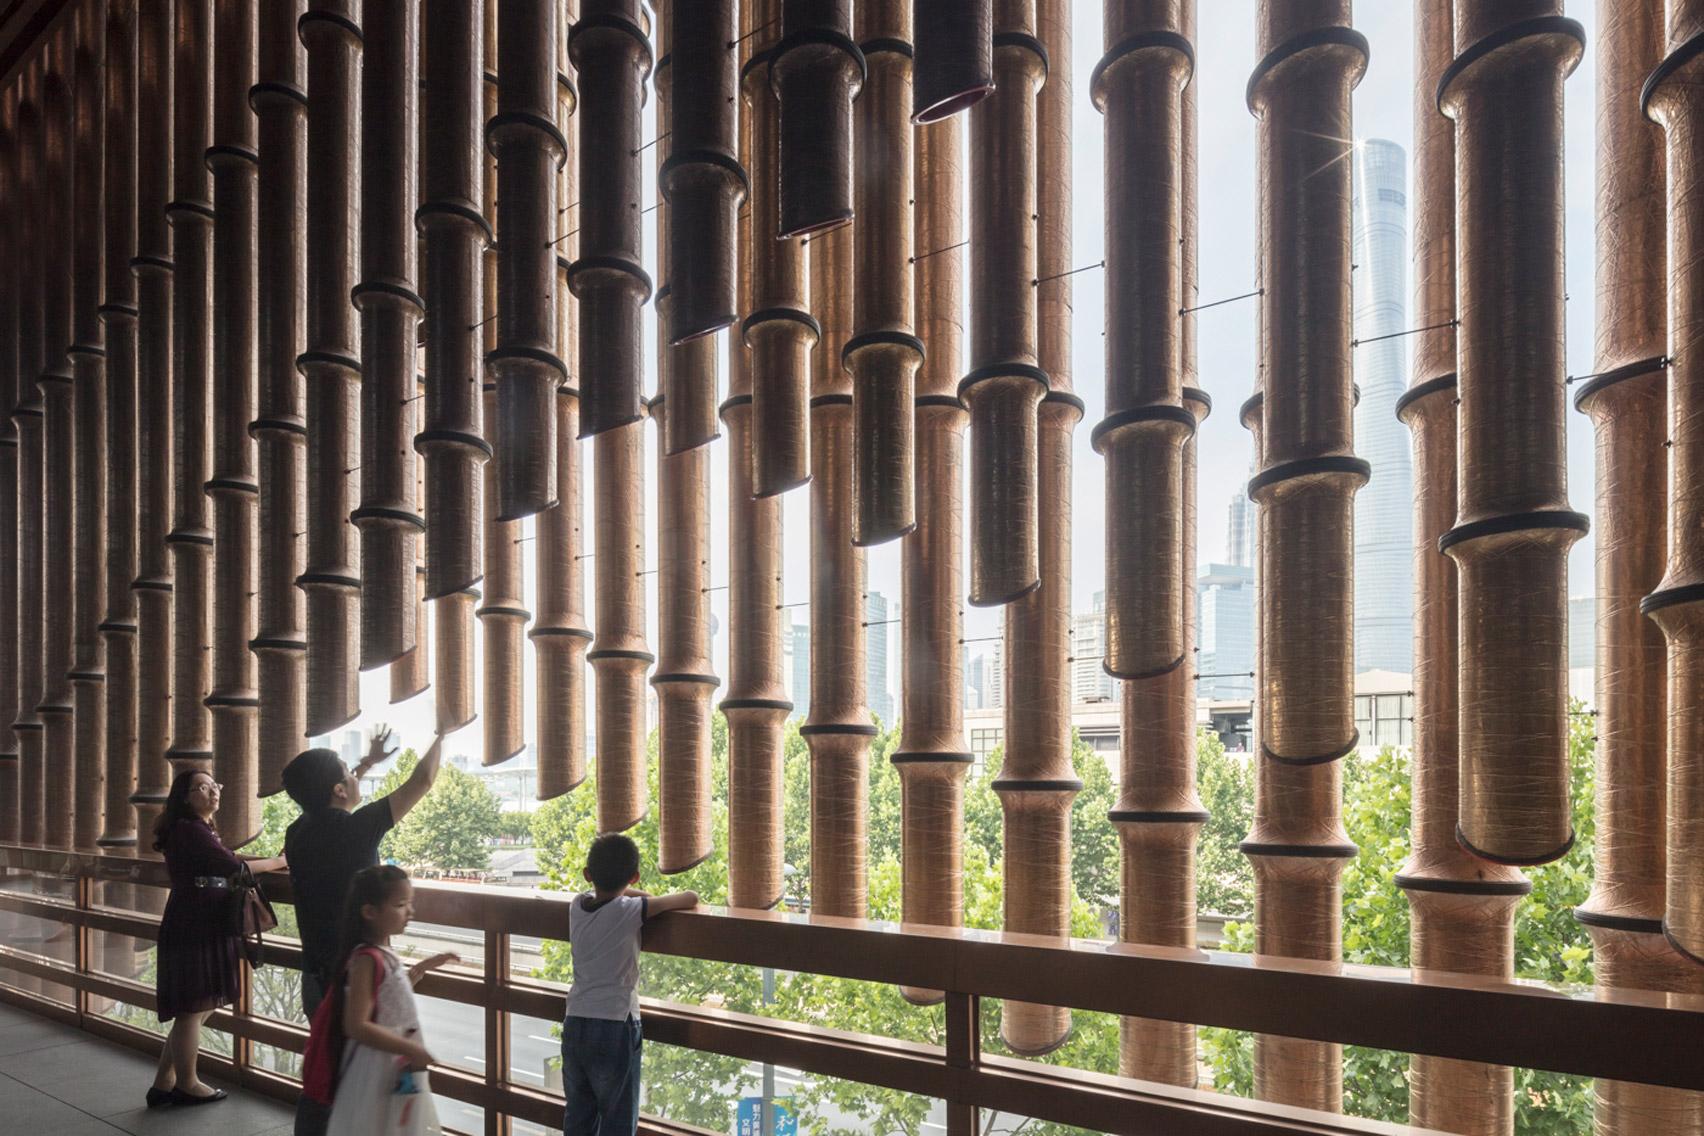 Fosun Foundation, Shanghai, 2017 – Foster + Partners, Heatherwick Studio